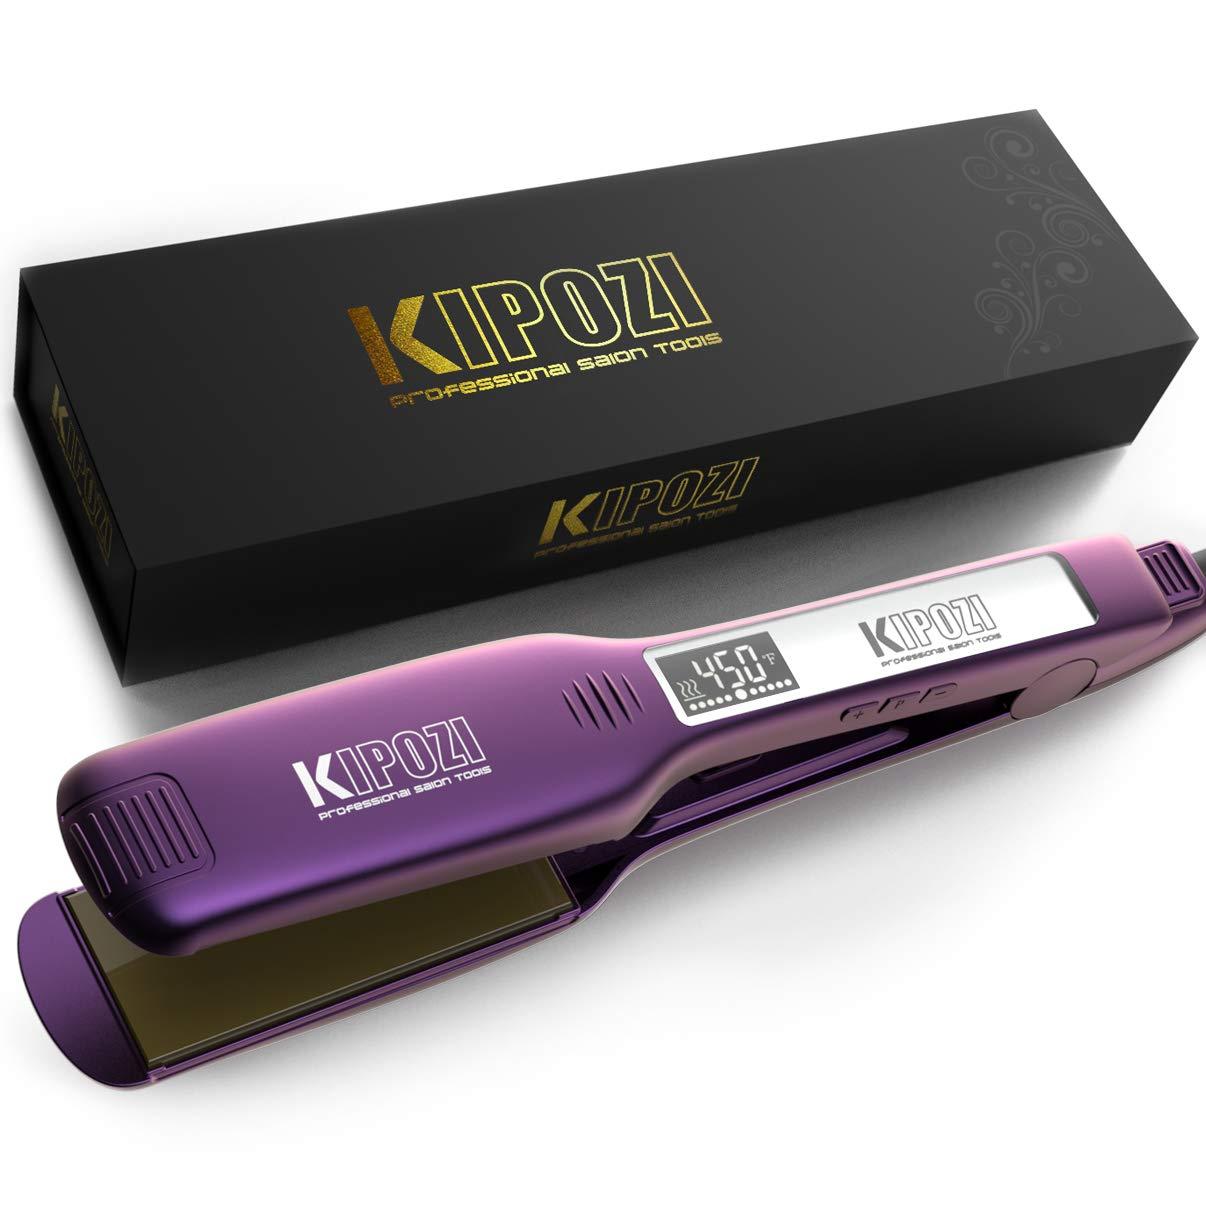 KIPOZI Professional Straightener Adjustable Temperature